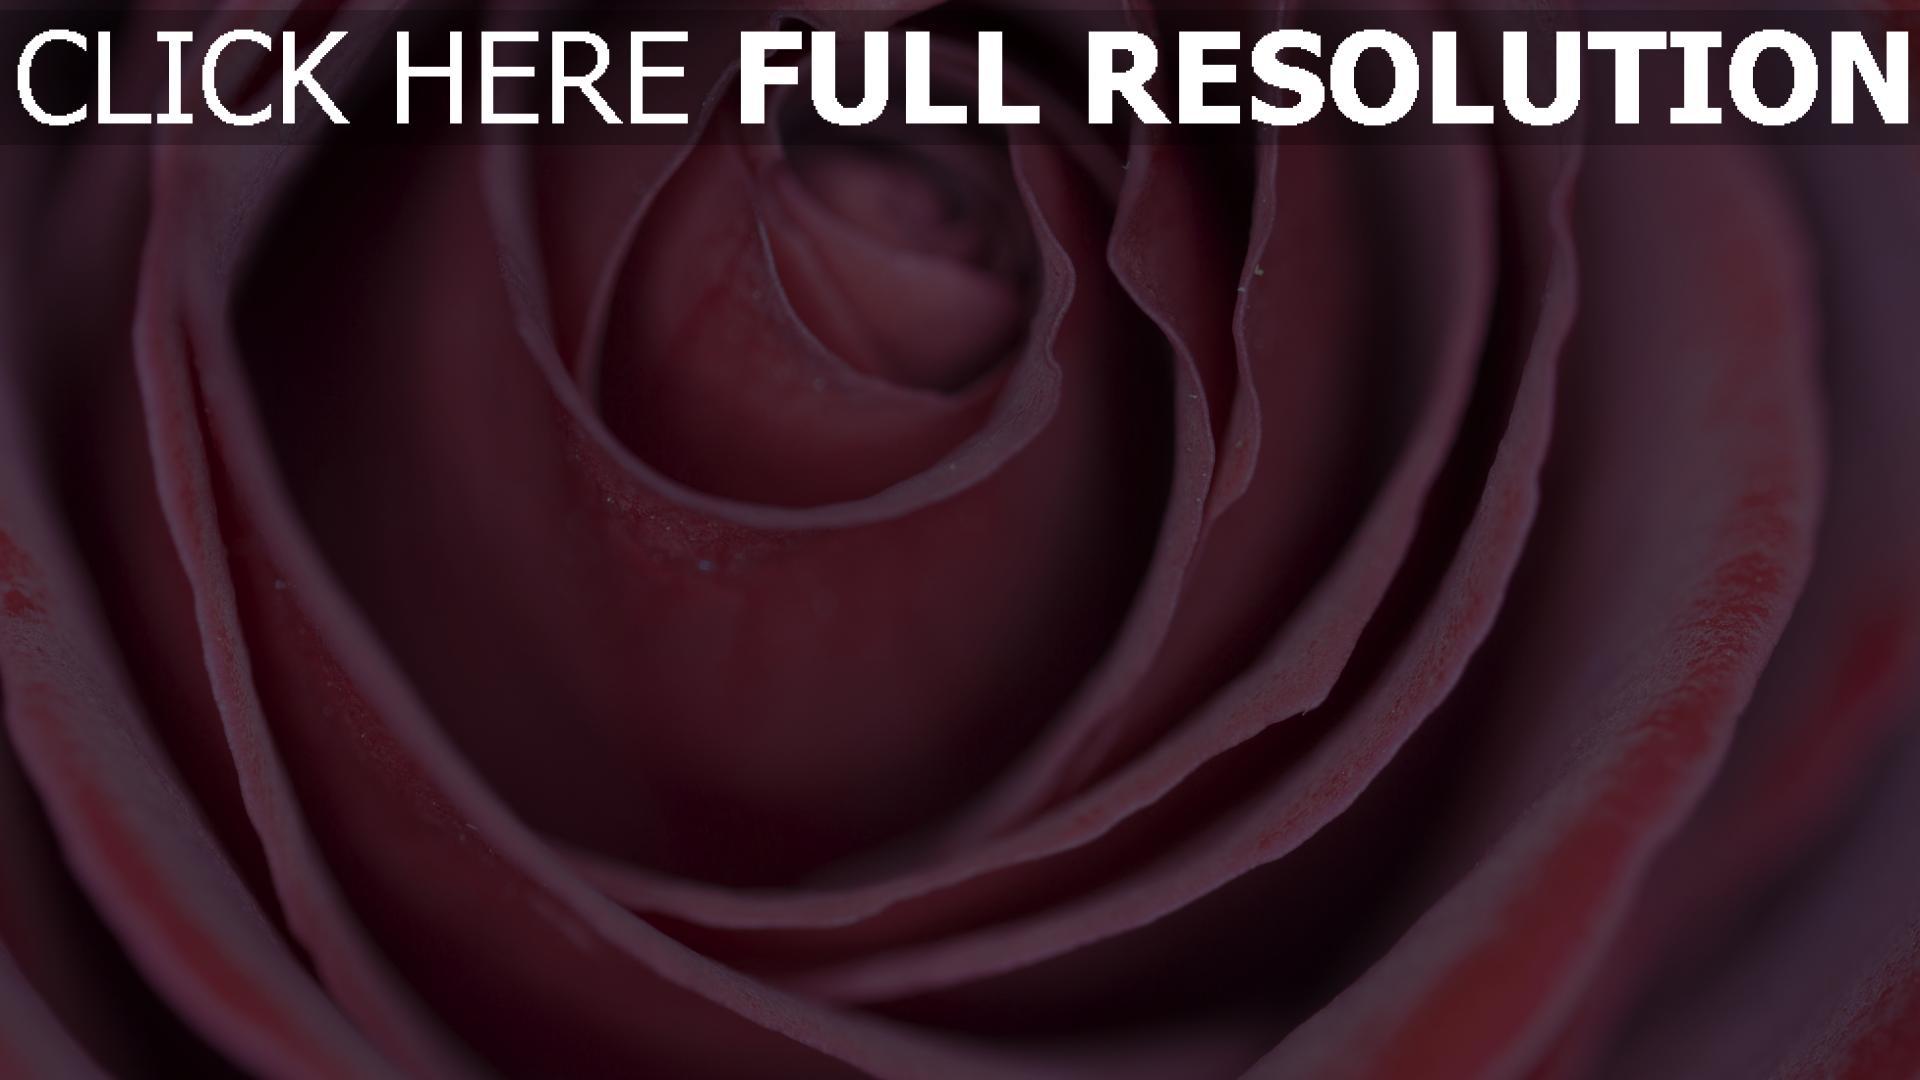 hd hintergrundbilder blütenblätter knospe rose 1920x1080